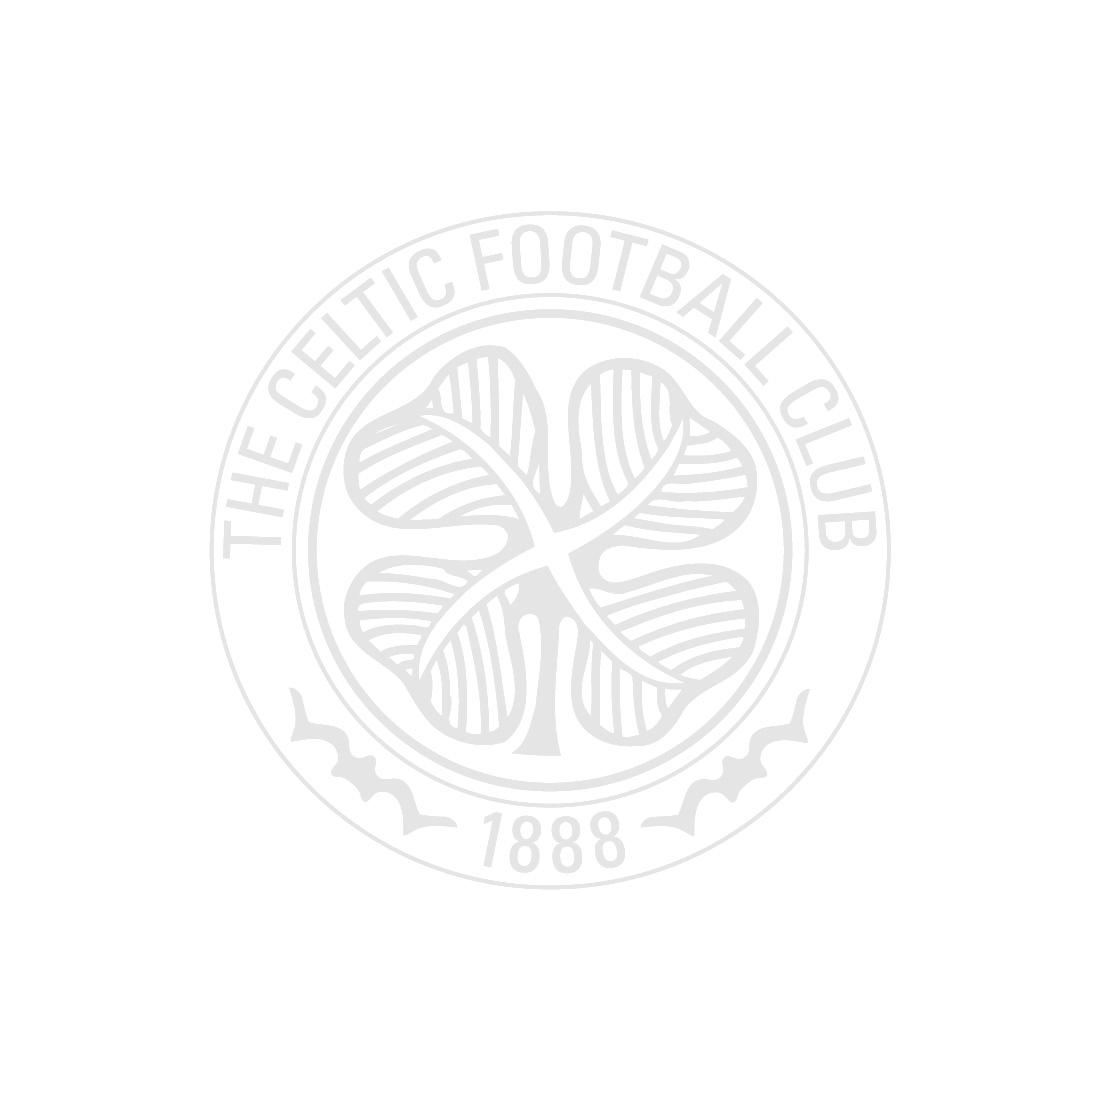 Celtic Honours Pennant Including Season 18/19